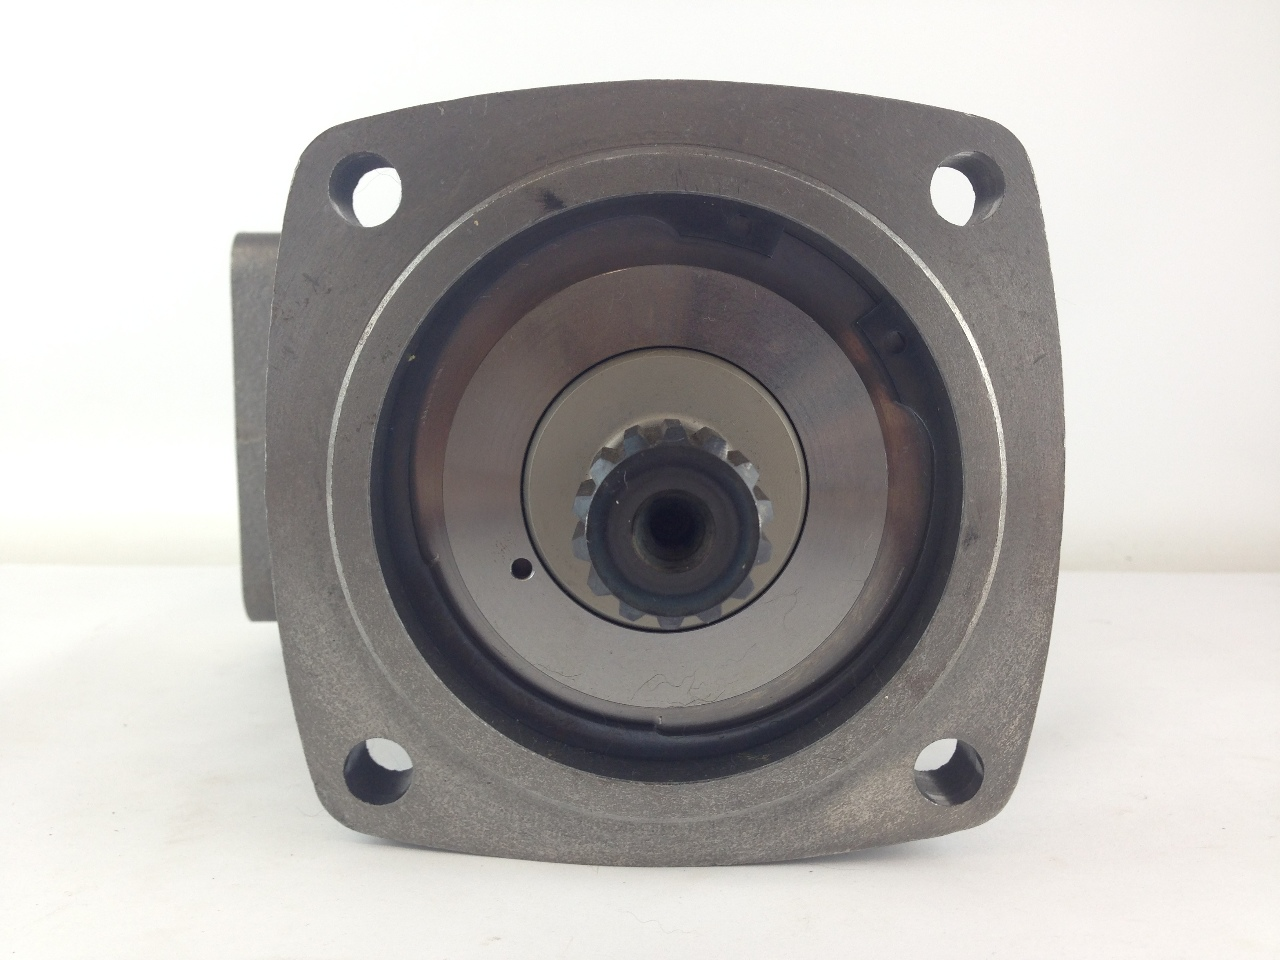 Parker 3780786 hydraulic motor f12 080 ms sv u 000 000 0 for Parker hydraulic motor distributors